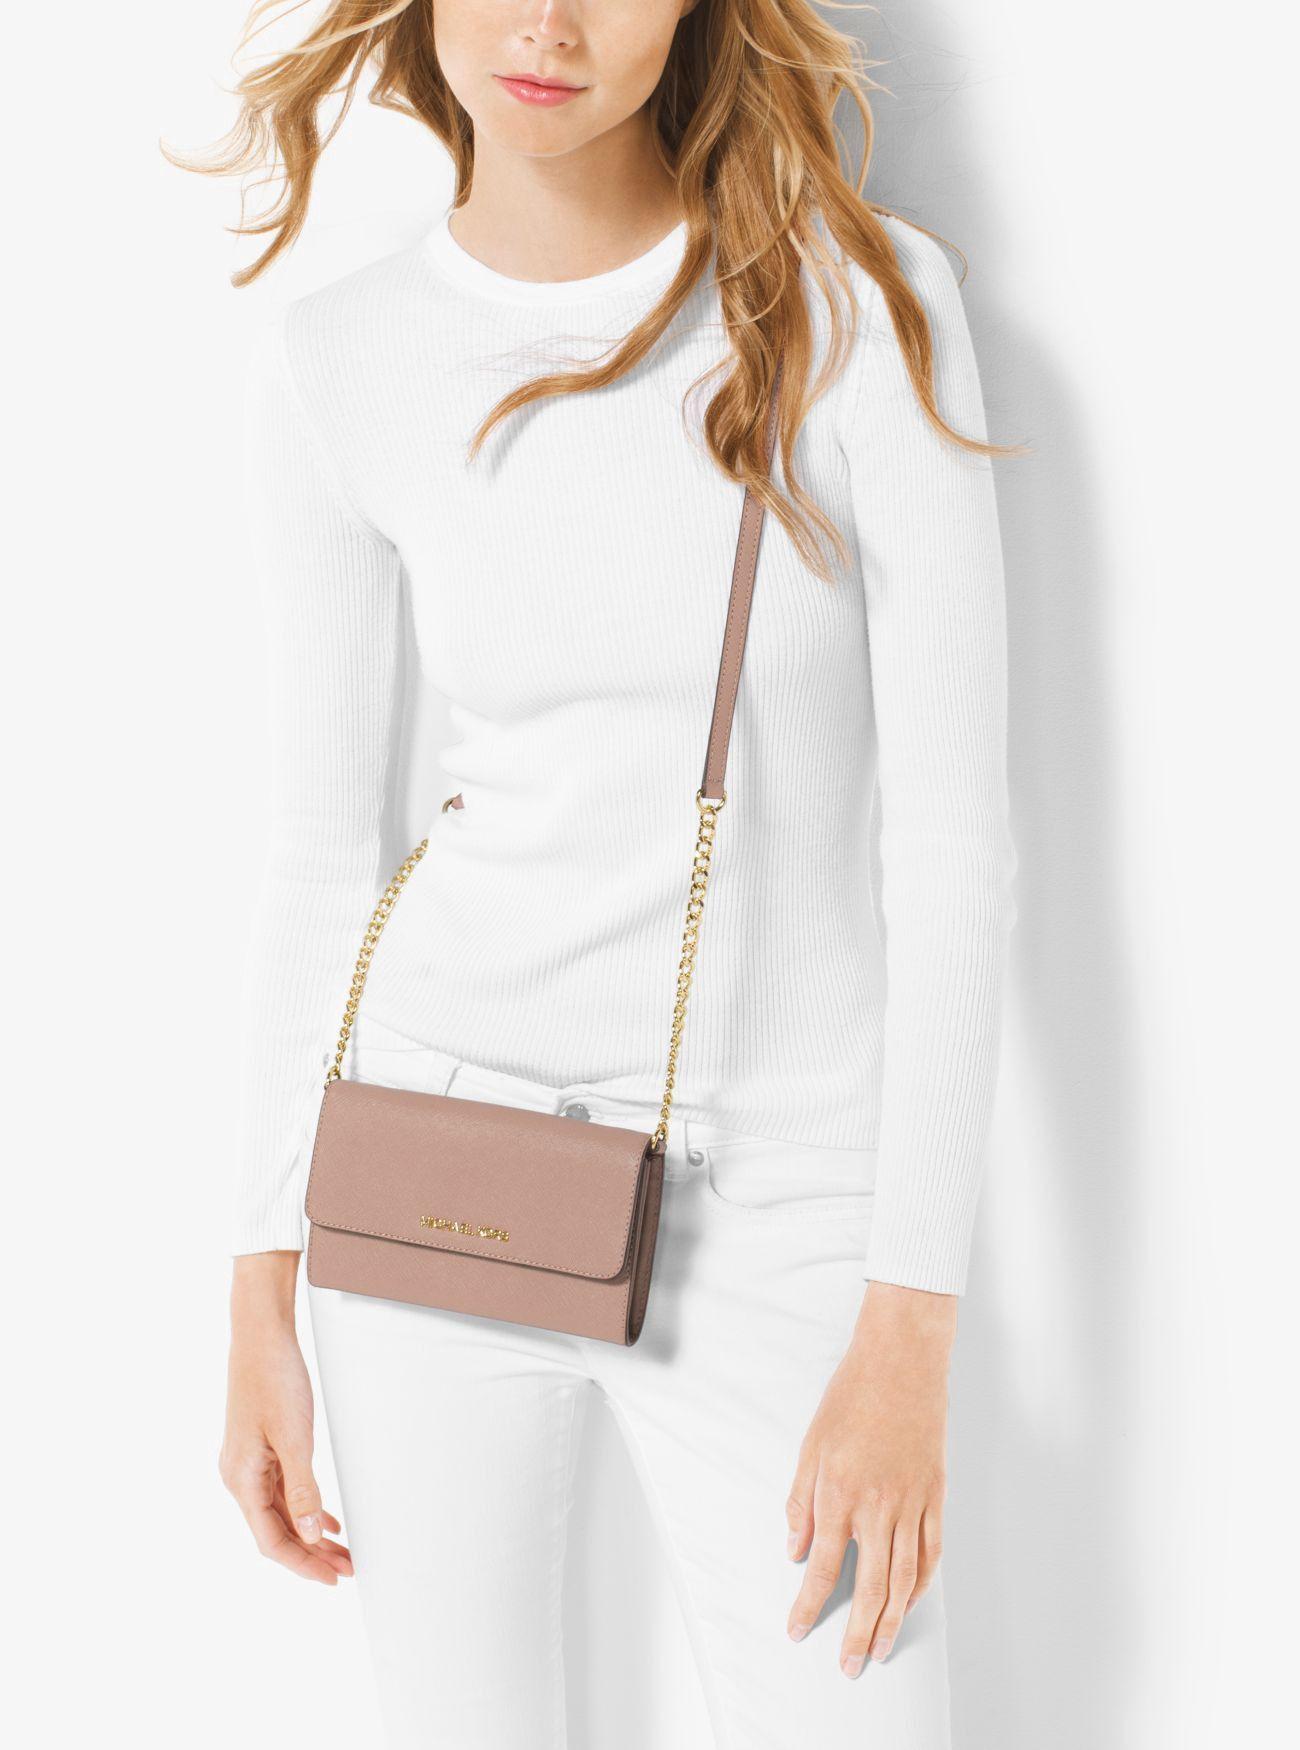 fb7b0fb0be6465 MICHAEL KORS Jet Set Travel Saffiano Leather Smartphone Crossbody. # michaelkors #bags #shoulder bags #leather #polyester #crossbody #lining #